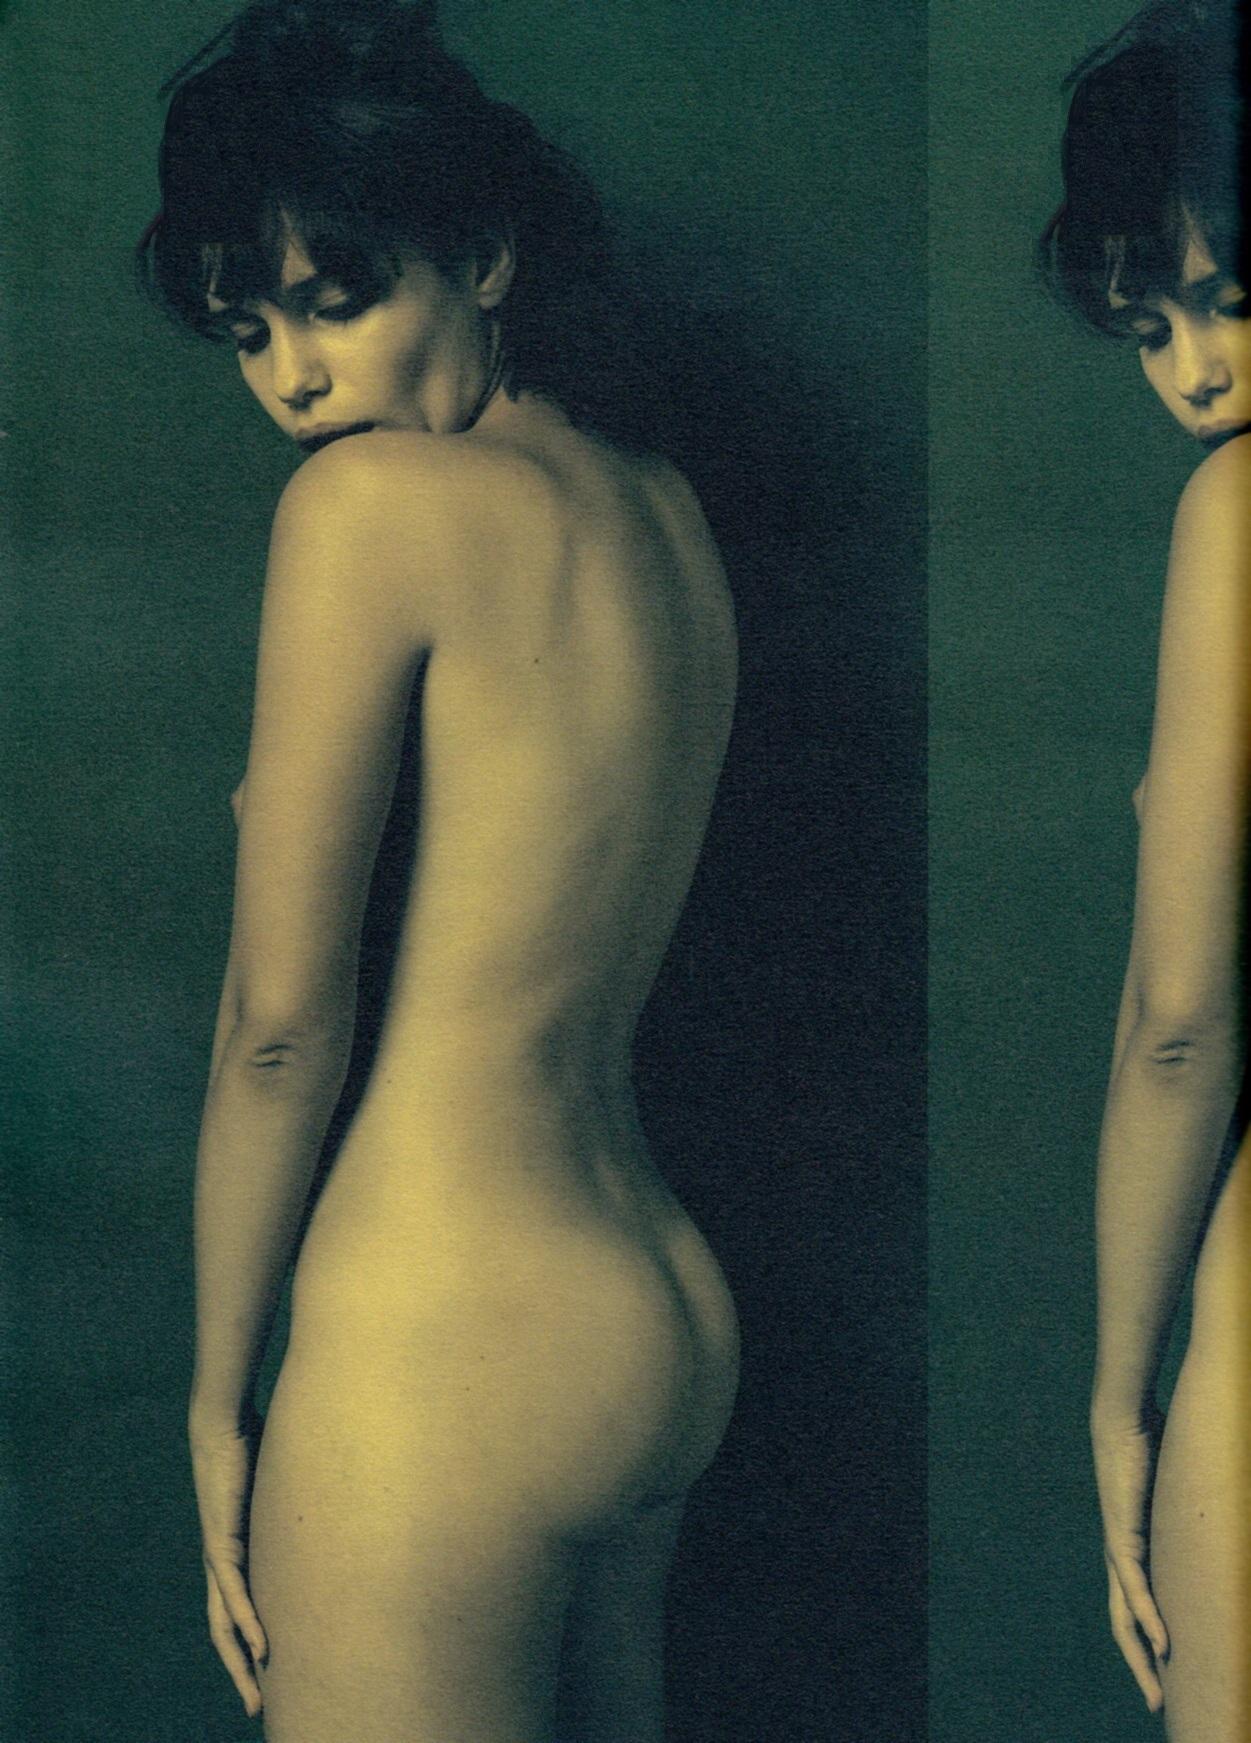 Bruna Linzmeyer Nude